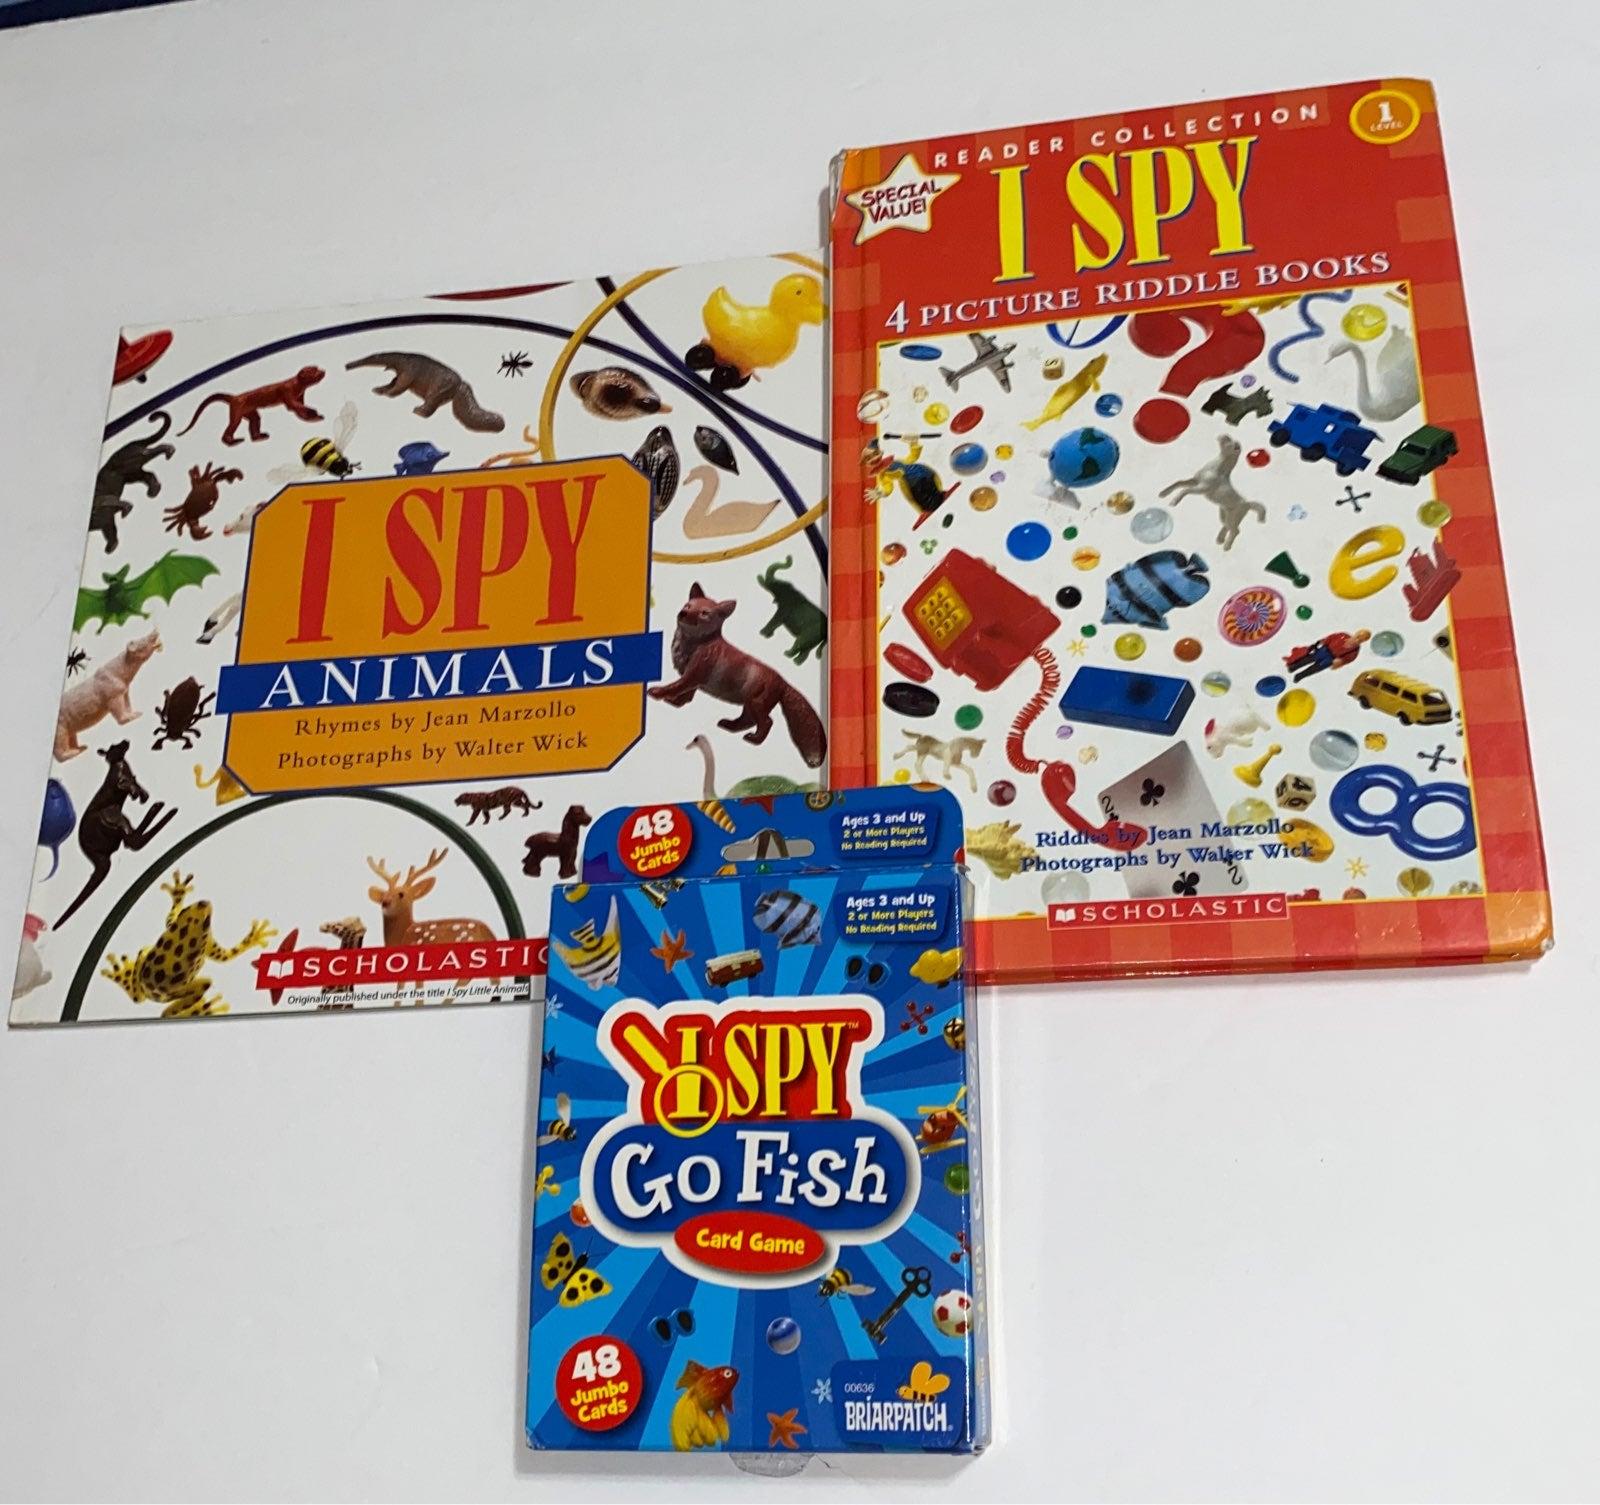 I Spy books and card game